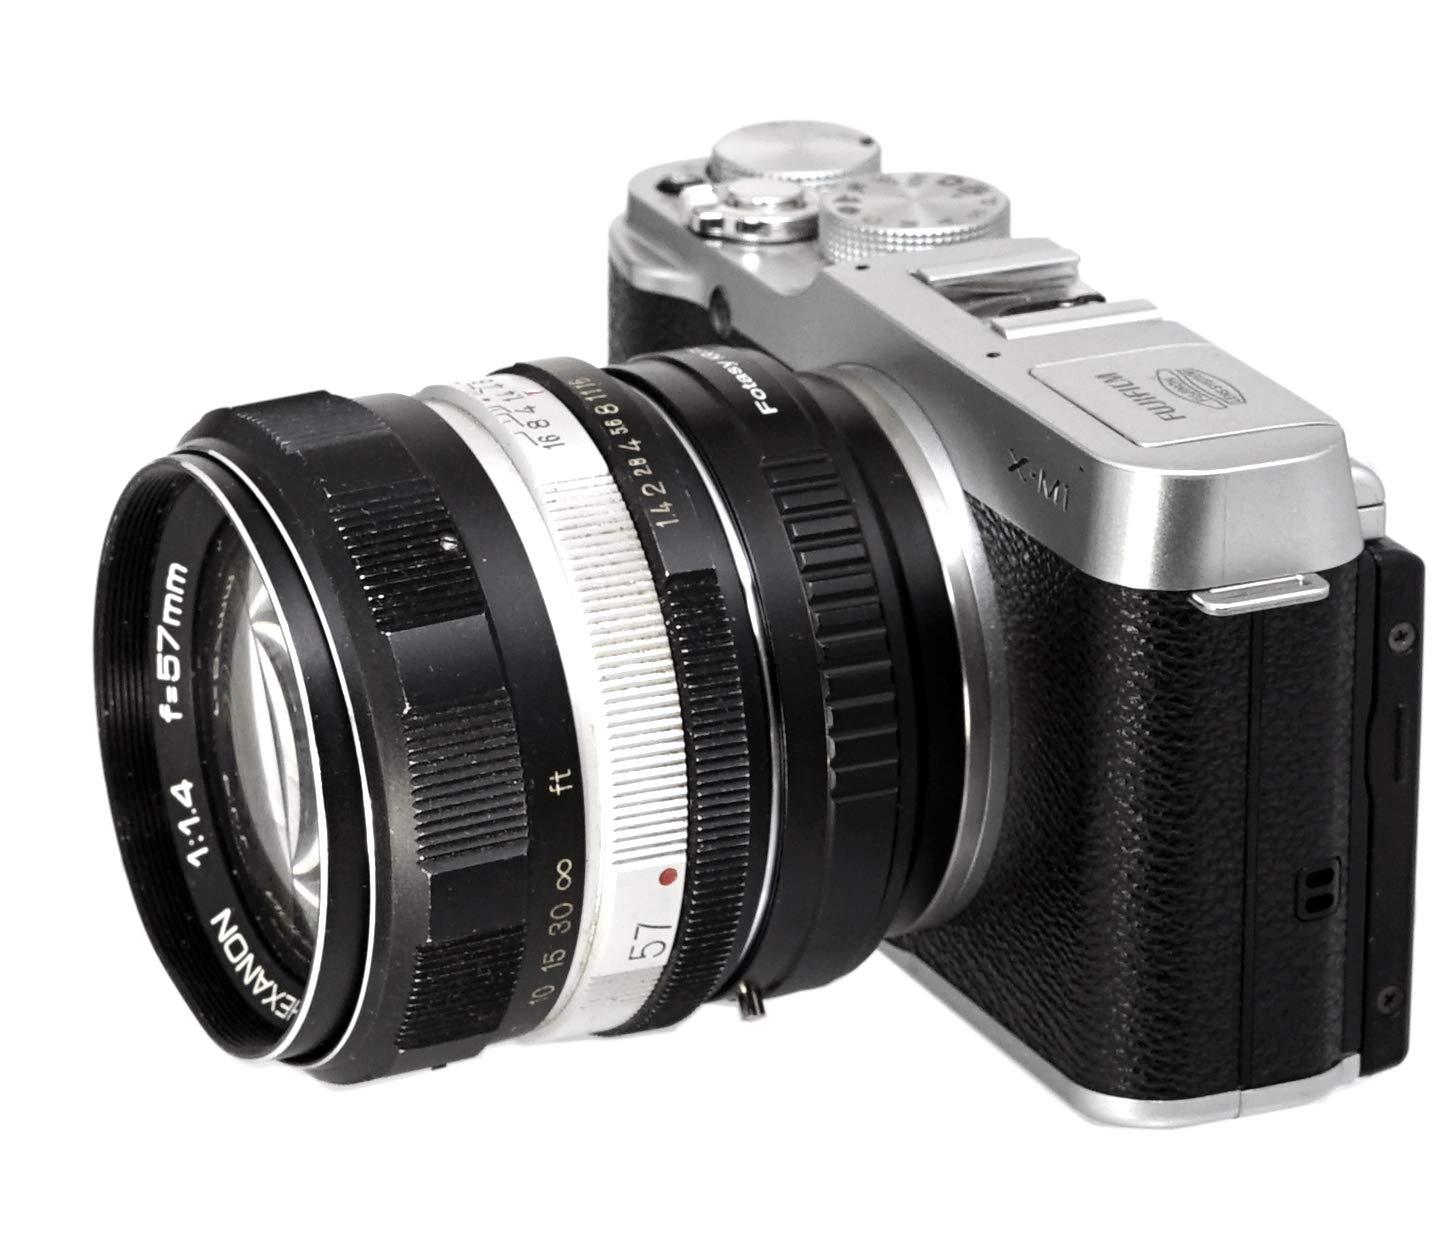 42mm Focusing Helicoid Fotasy M42 Lens to Fuji X Macro Focusing Helicoid Compatible with M42 Lens and X-Pro2 X-E1 X-E2 X-E3 X-A5 X-M1 X-T1 X-T2 X-T3 X-T10 X-T20 X-T30 X-H1